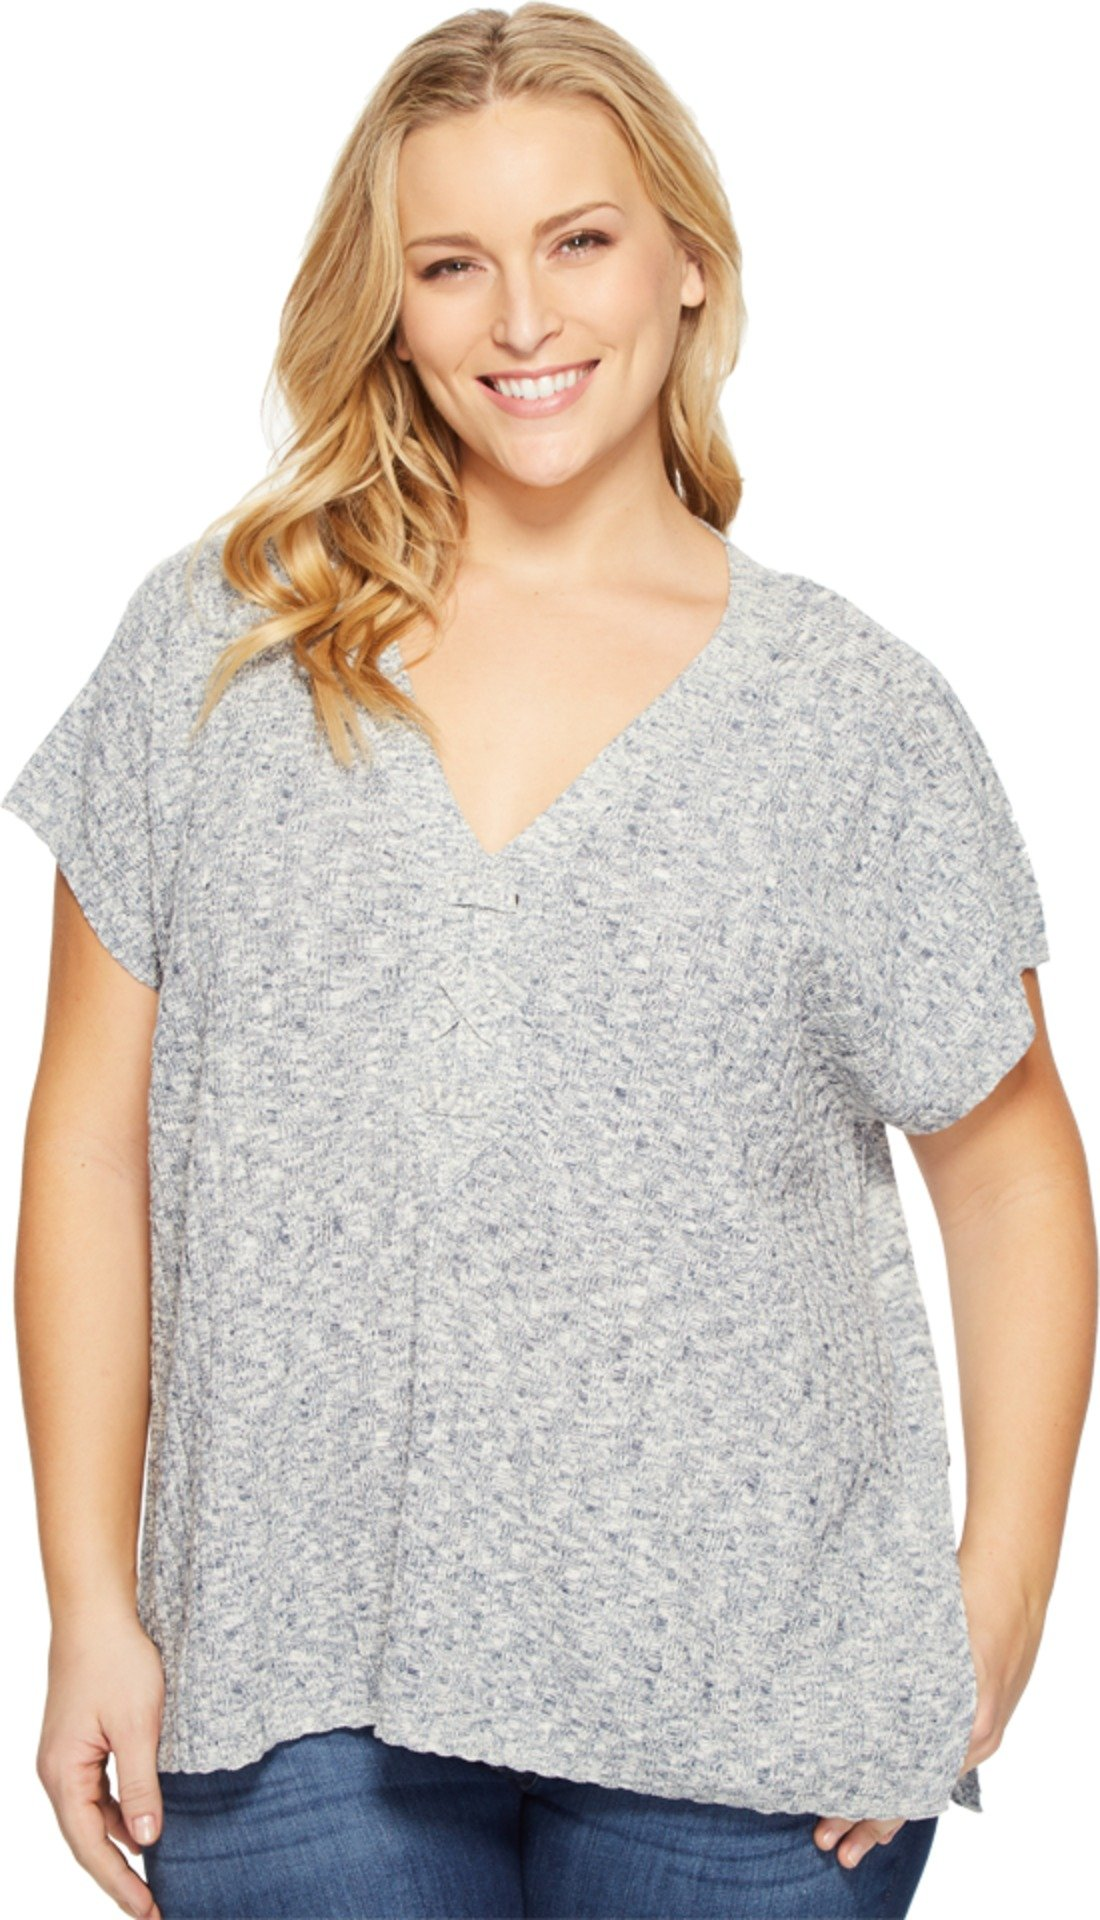 NYDJ Women's Plus Size Heathered Lace up Short Sleeve Sweater, Kingston Blue, 1X